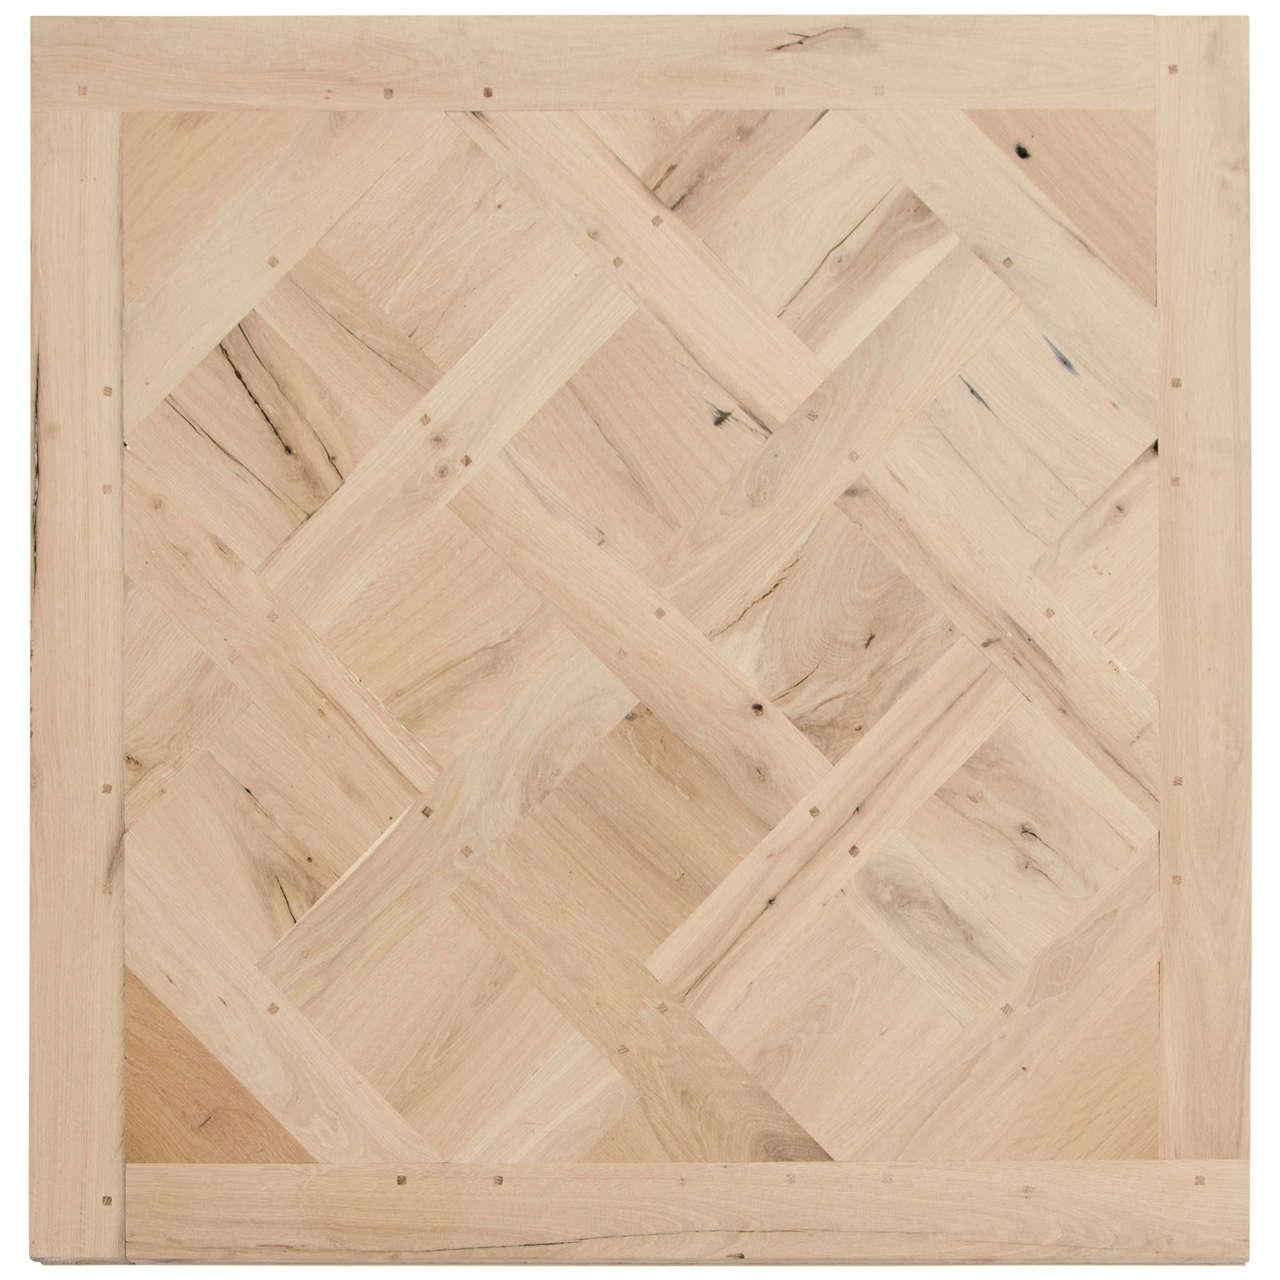 reclaimed oak versailles parquet flooring at 1stdibs. Black Bedroom Furniture Sets. Home Design Ideas